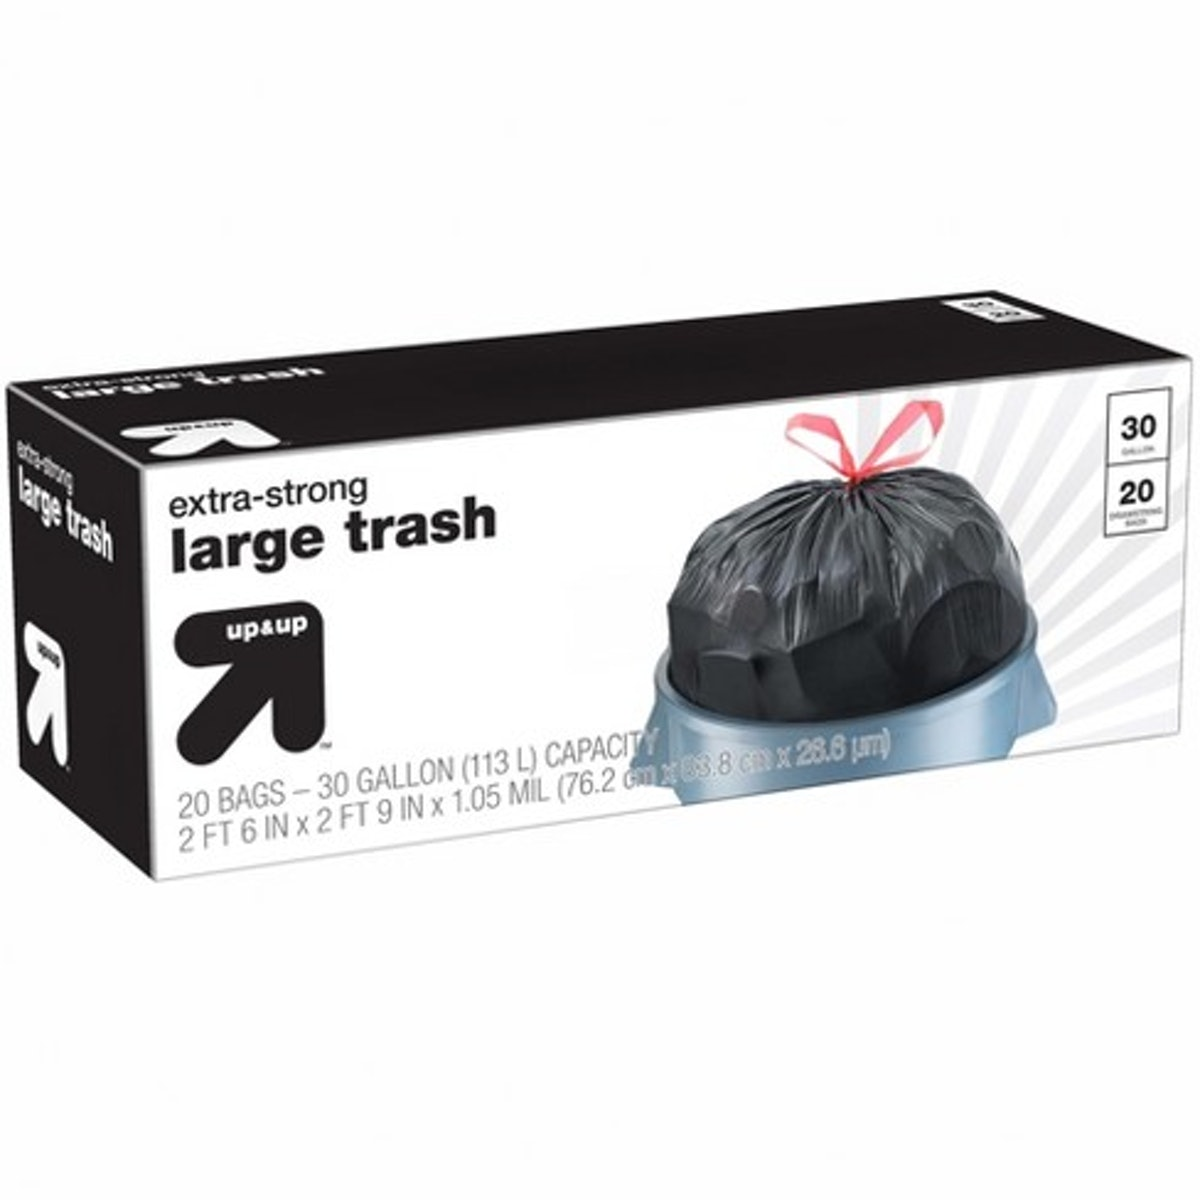 Extra-Strong Large Drawstring Trash Bags